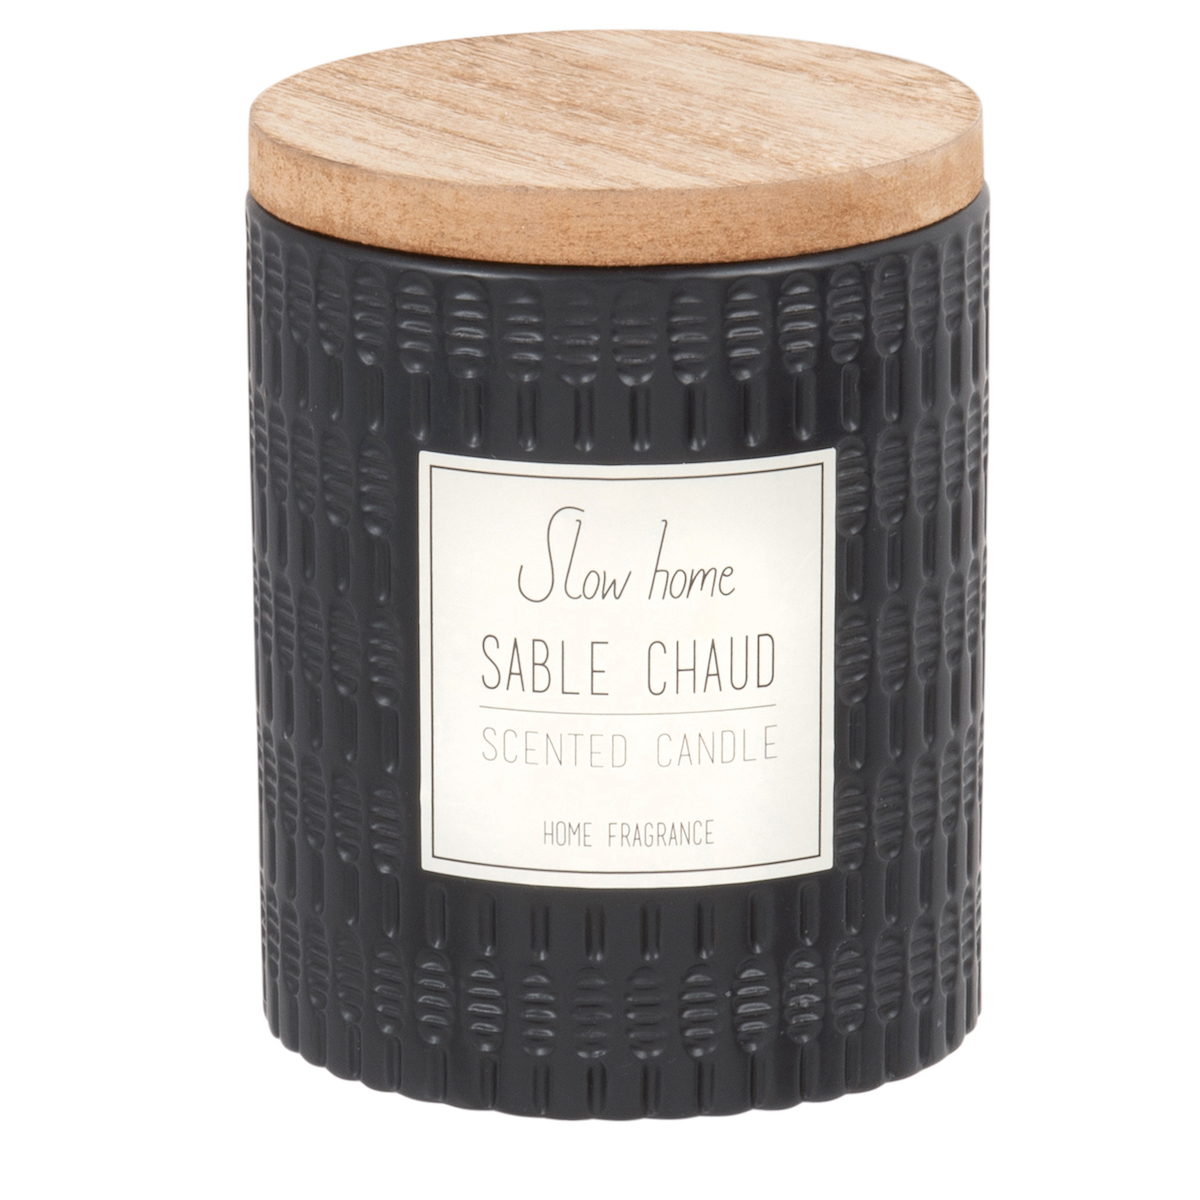 Vela perfumada en tarro de cerámica amartillada negra